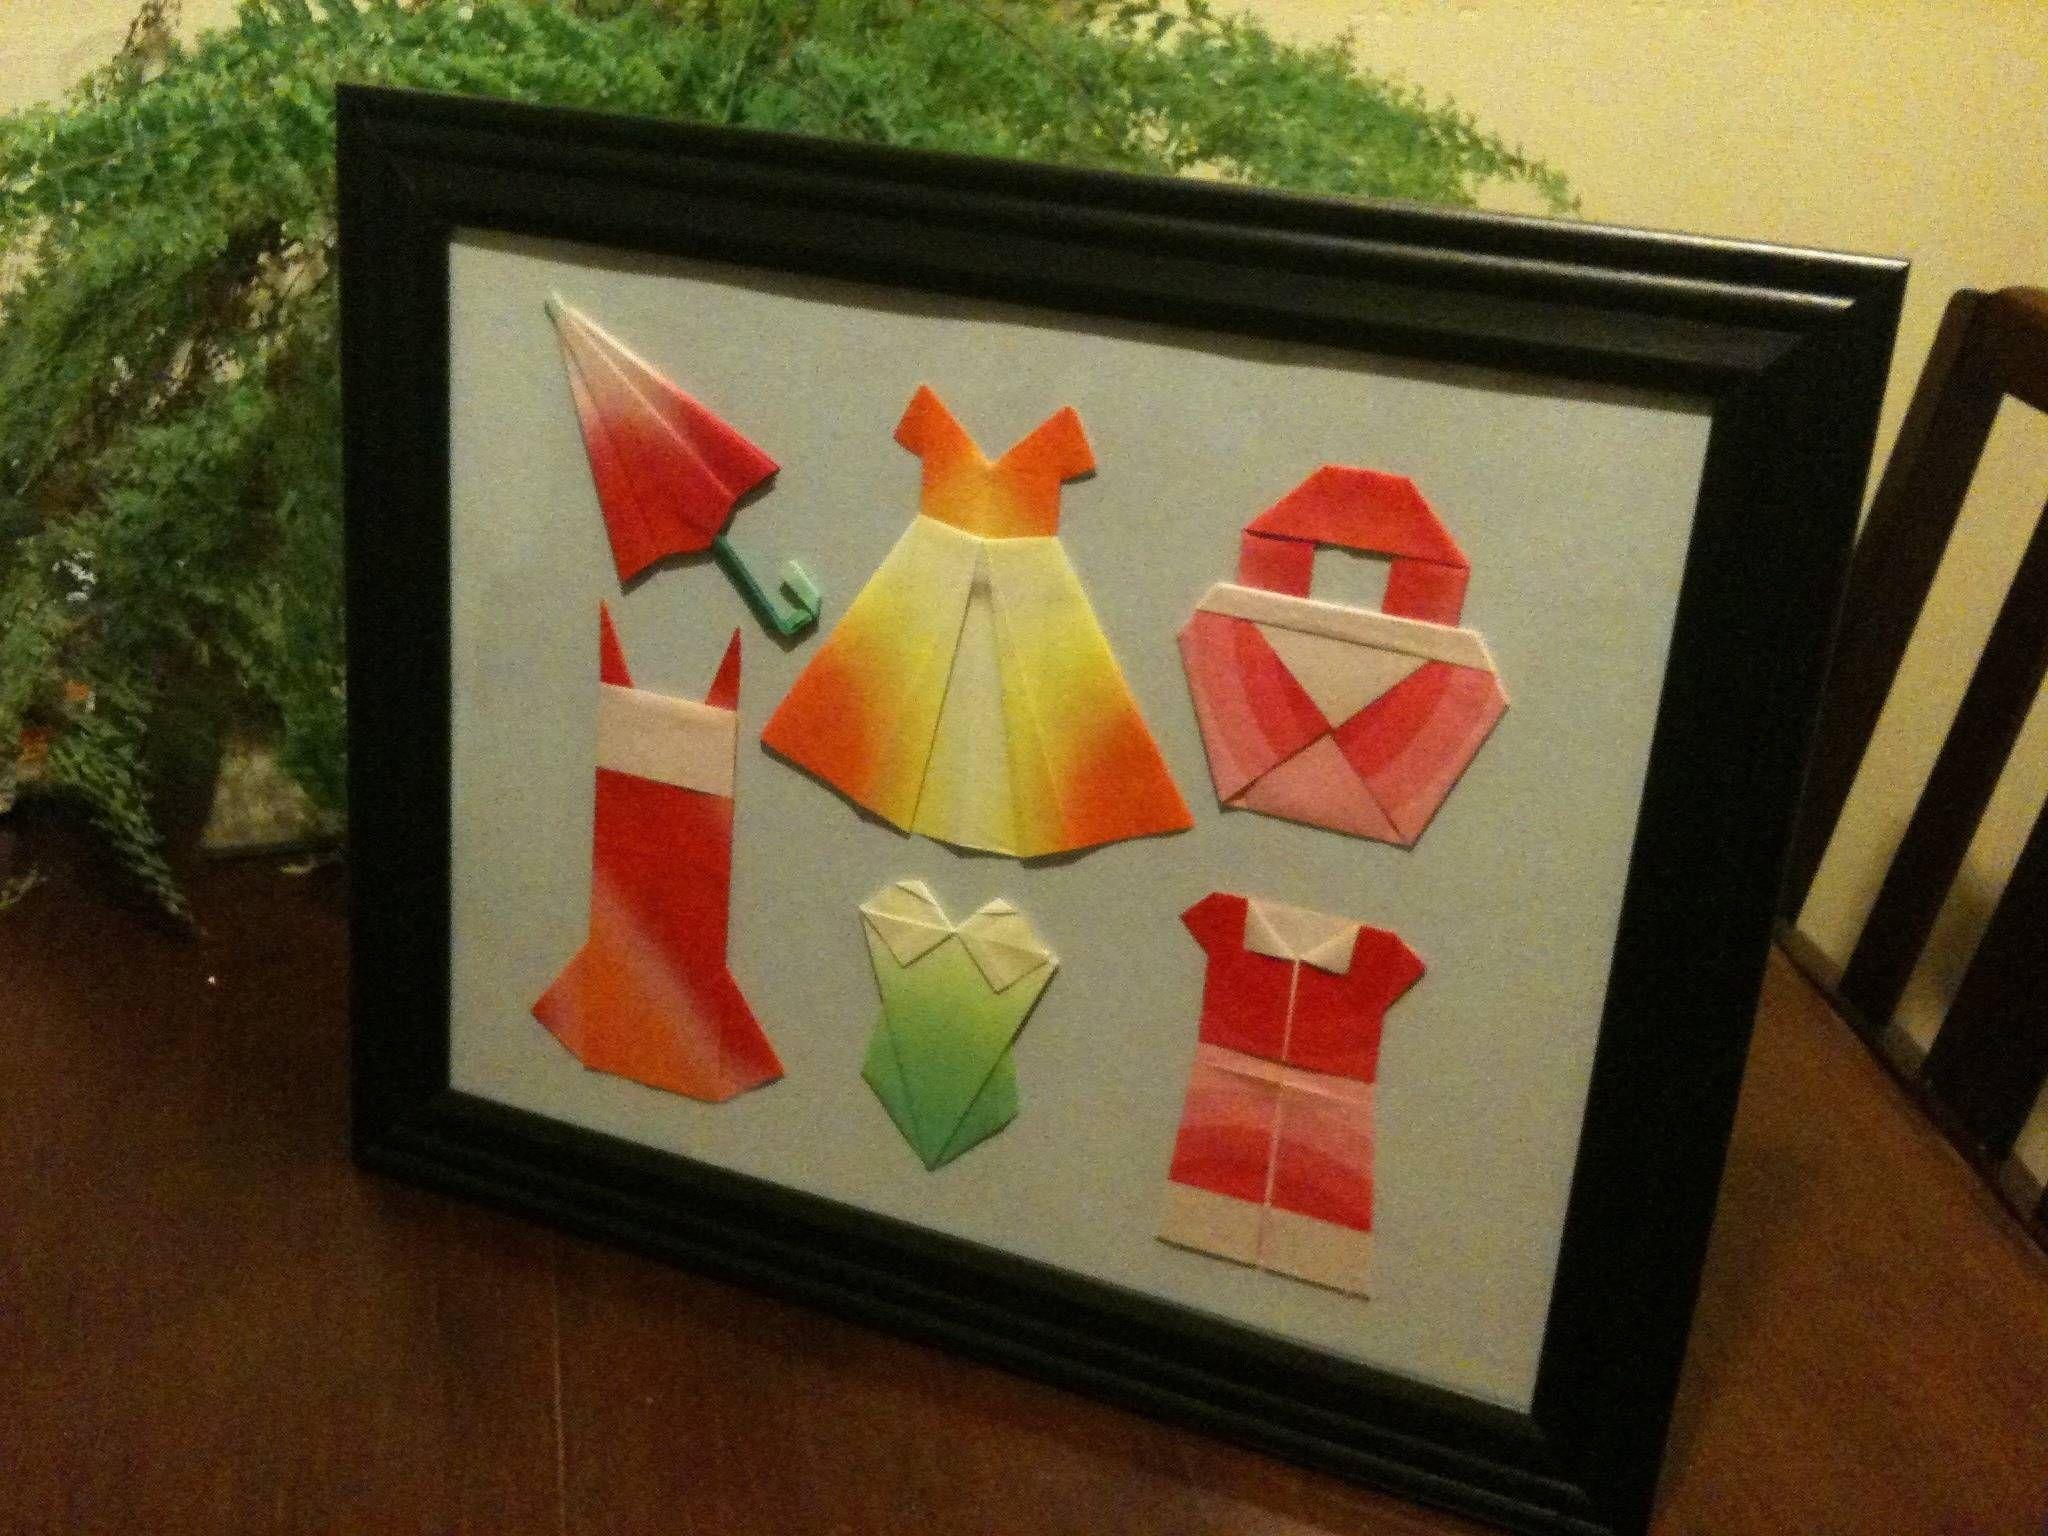 origami wardrobe googled instructions on how to make